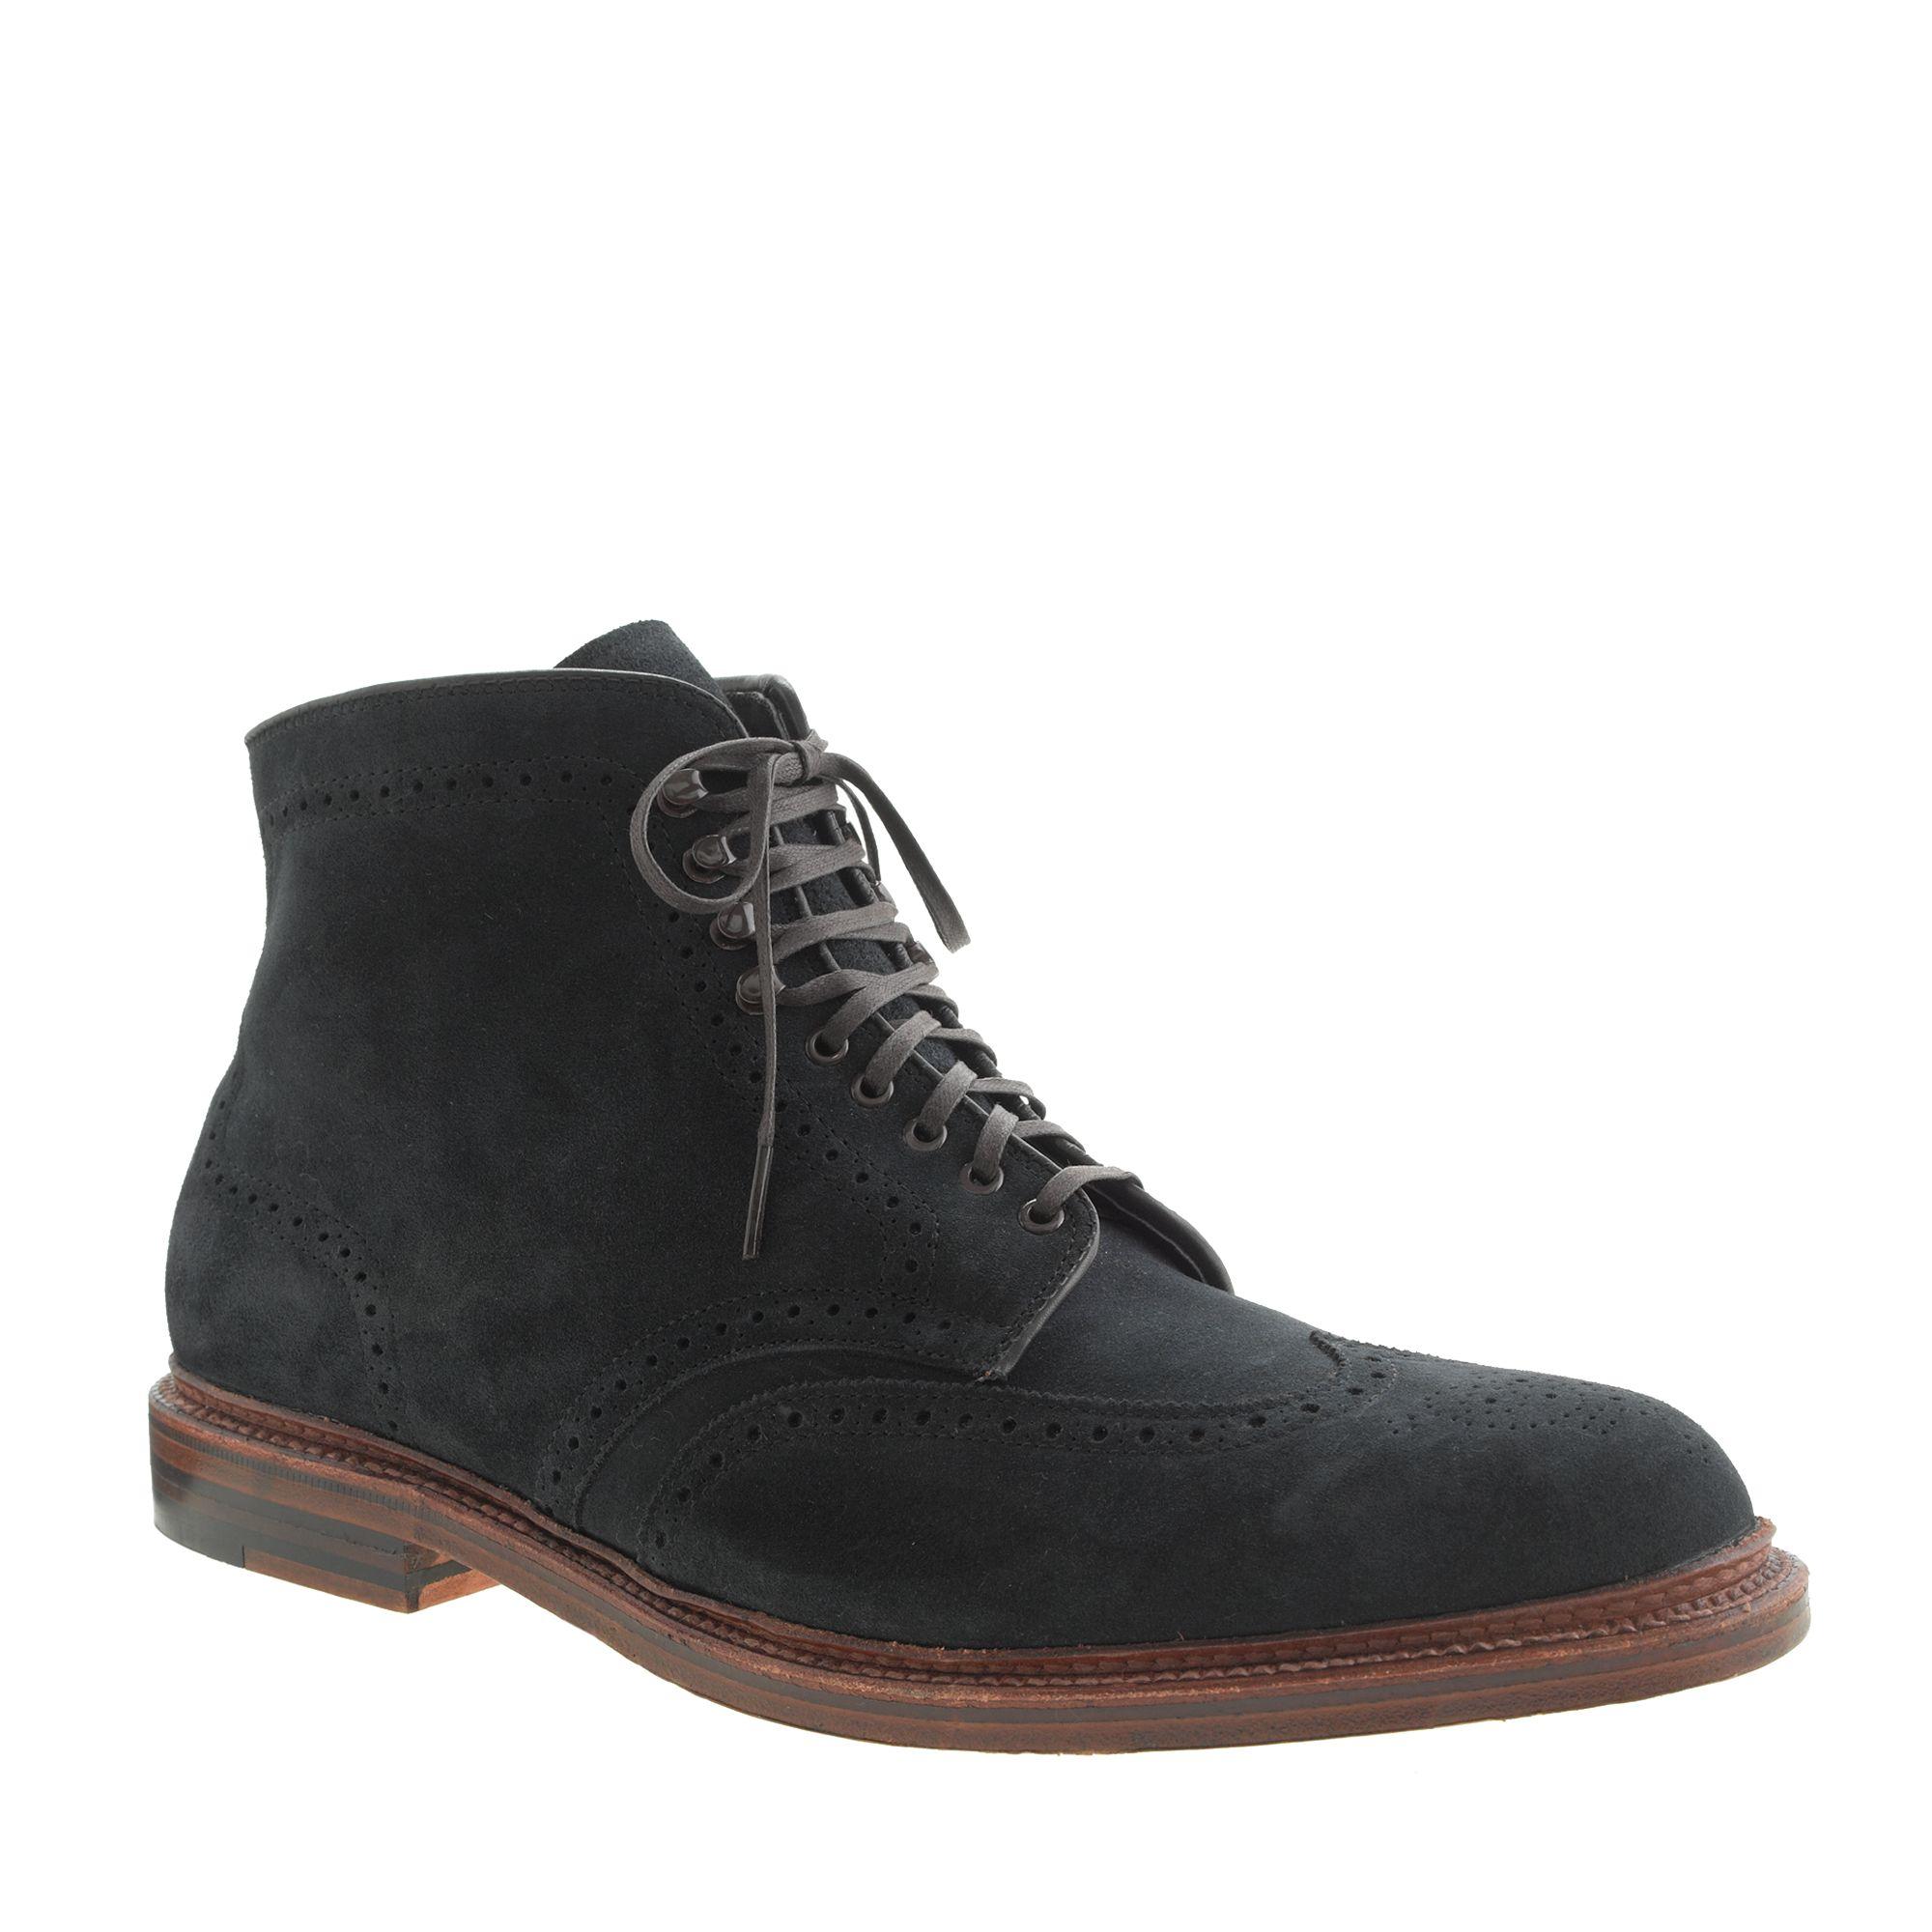 Alden for jcrew wing tip boots in blue for men for The alden